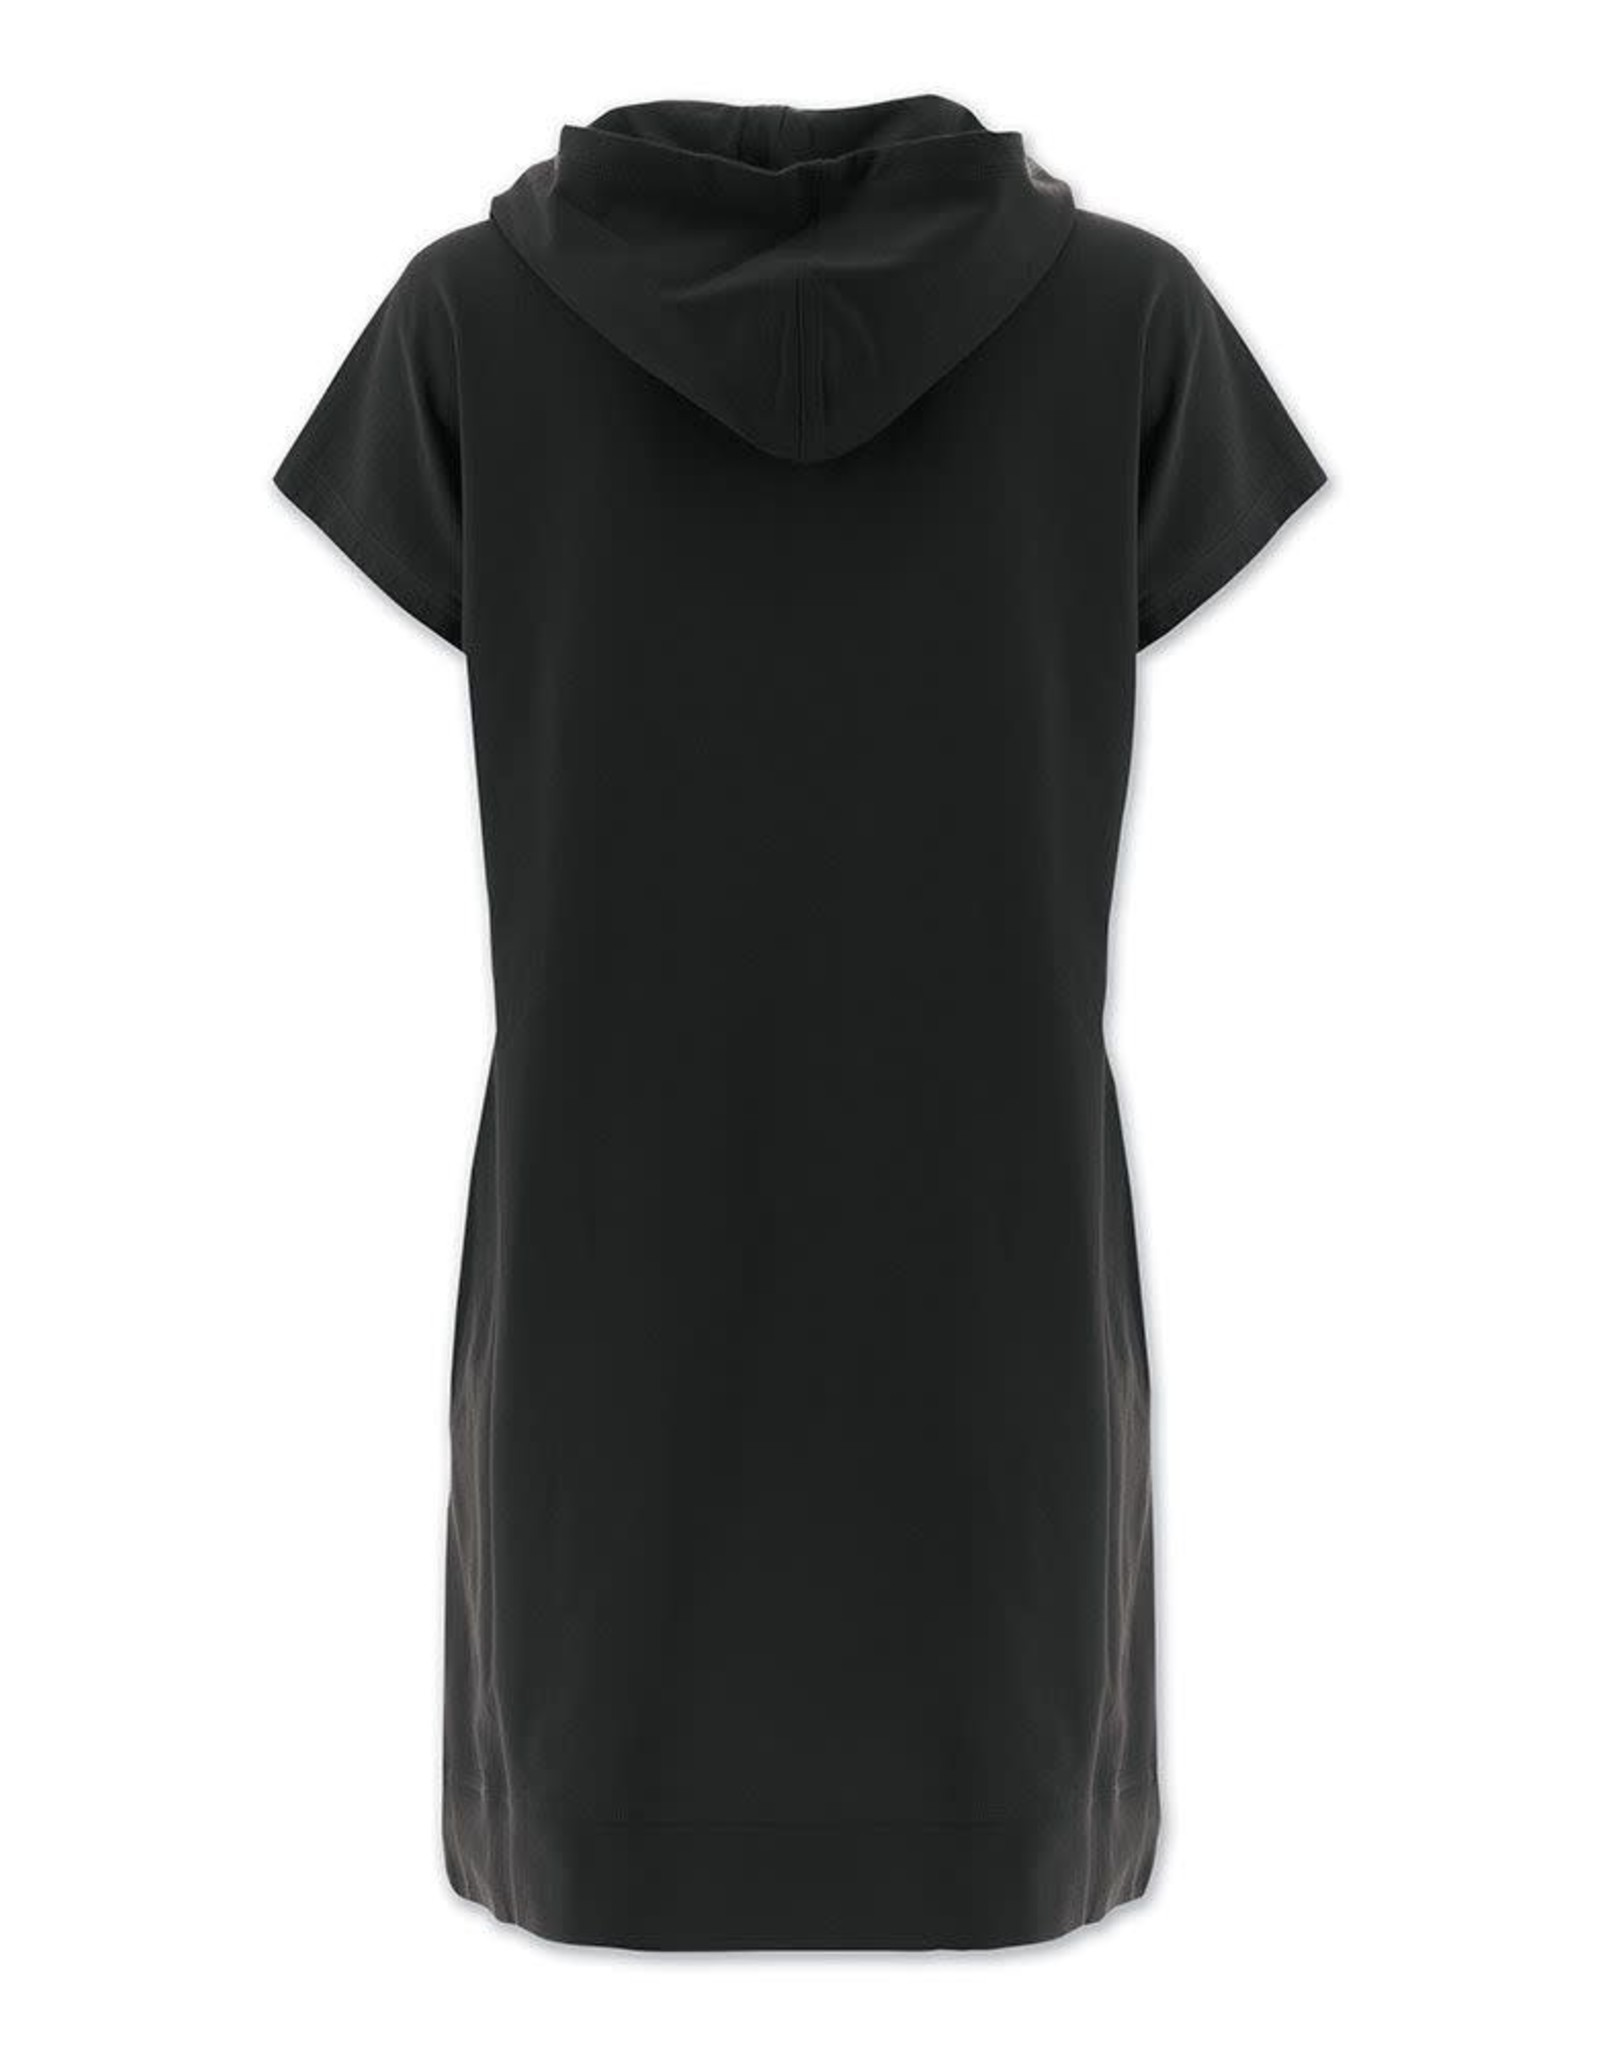 - Black Hoodie Dress w/Pockets